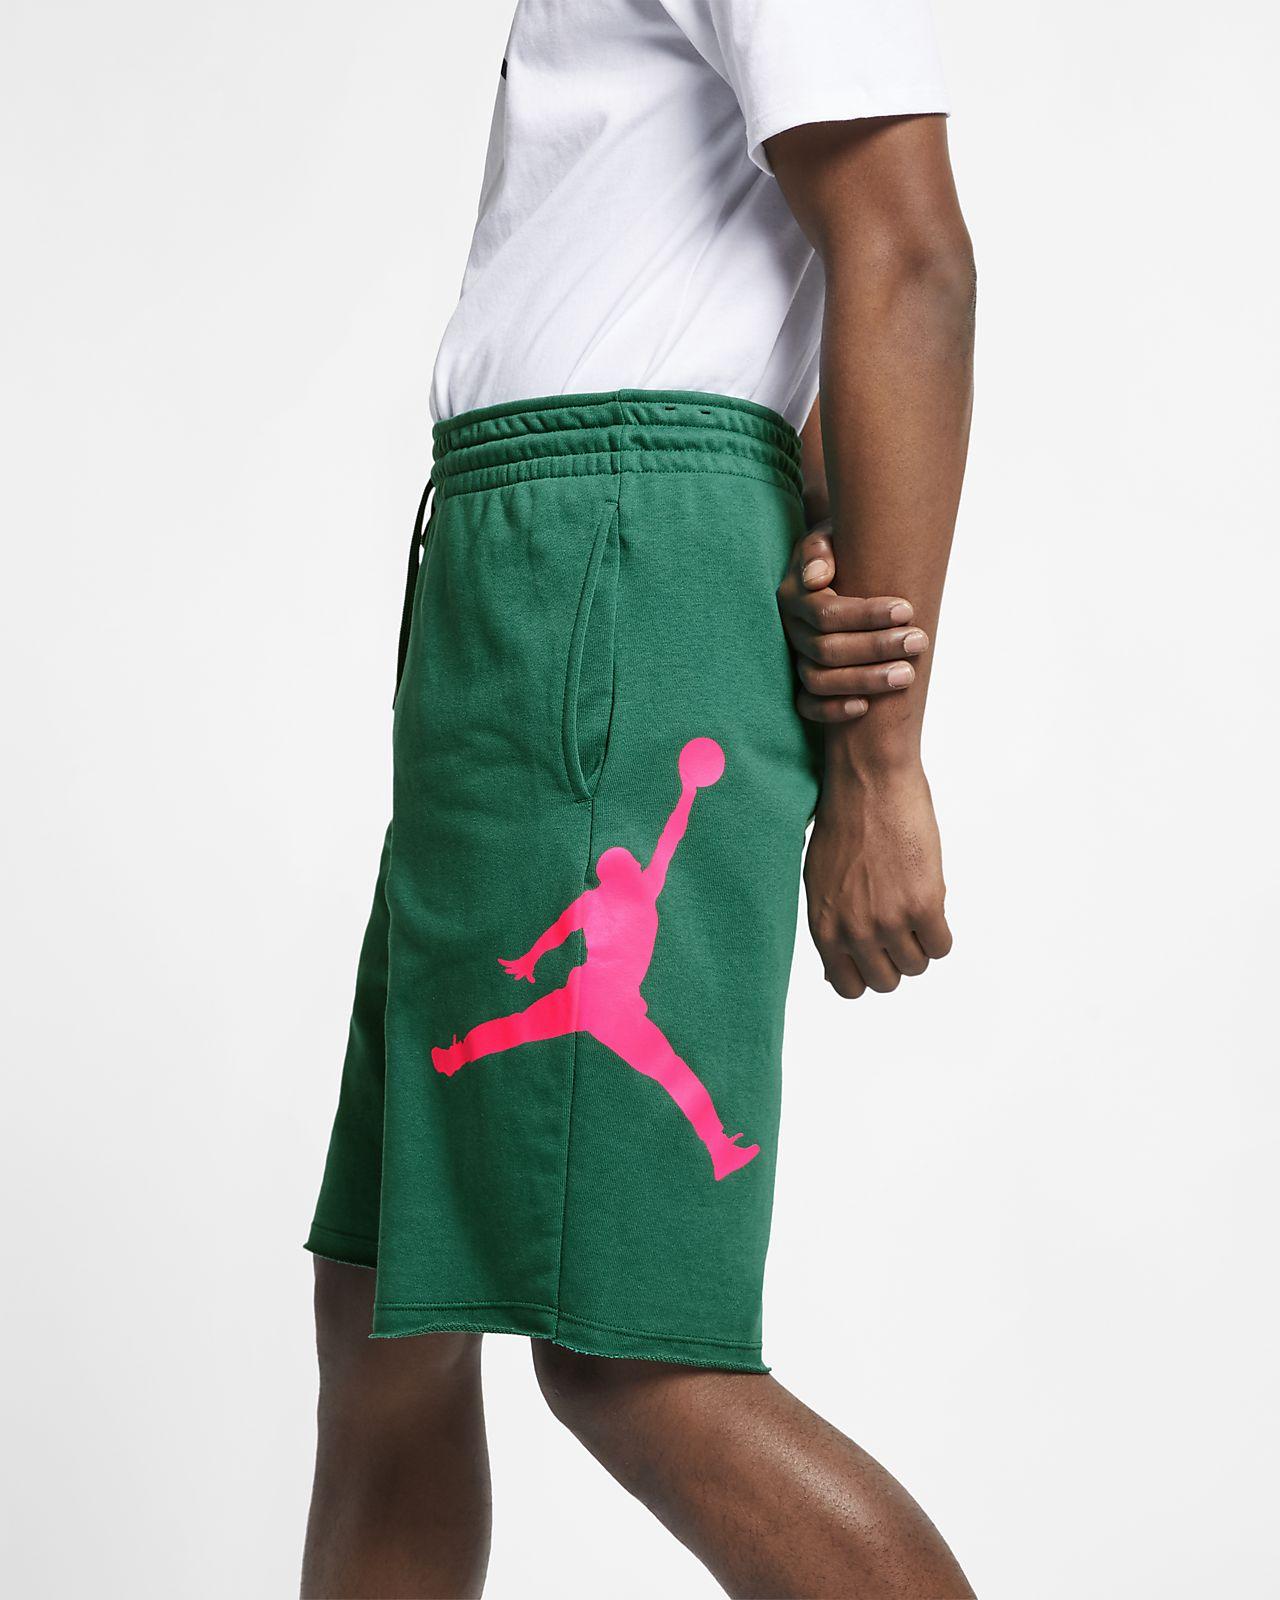 355ccdea7e62 Jordan Jumpman Logo Men s Fleece Shorts. Nike.com MA